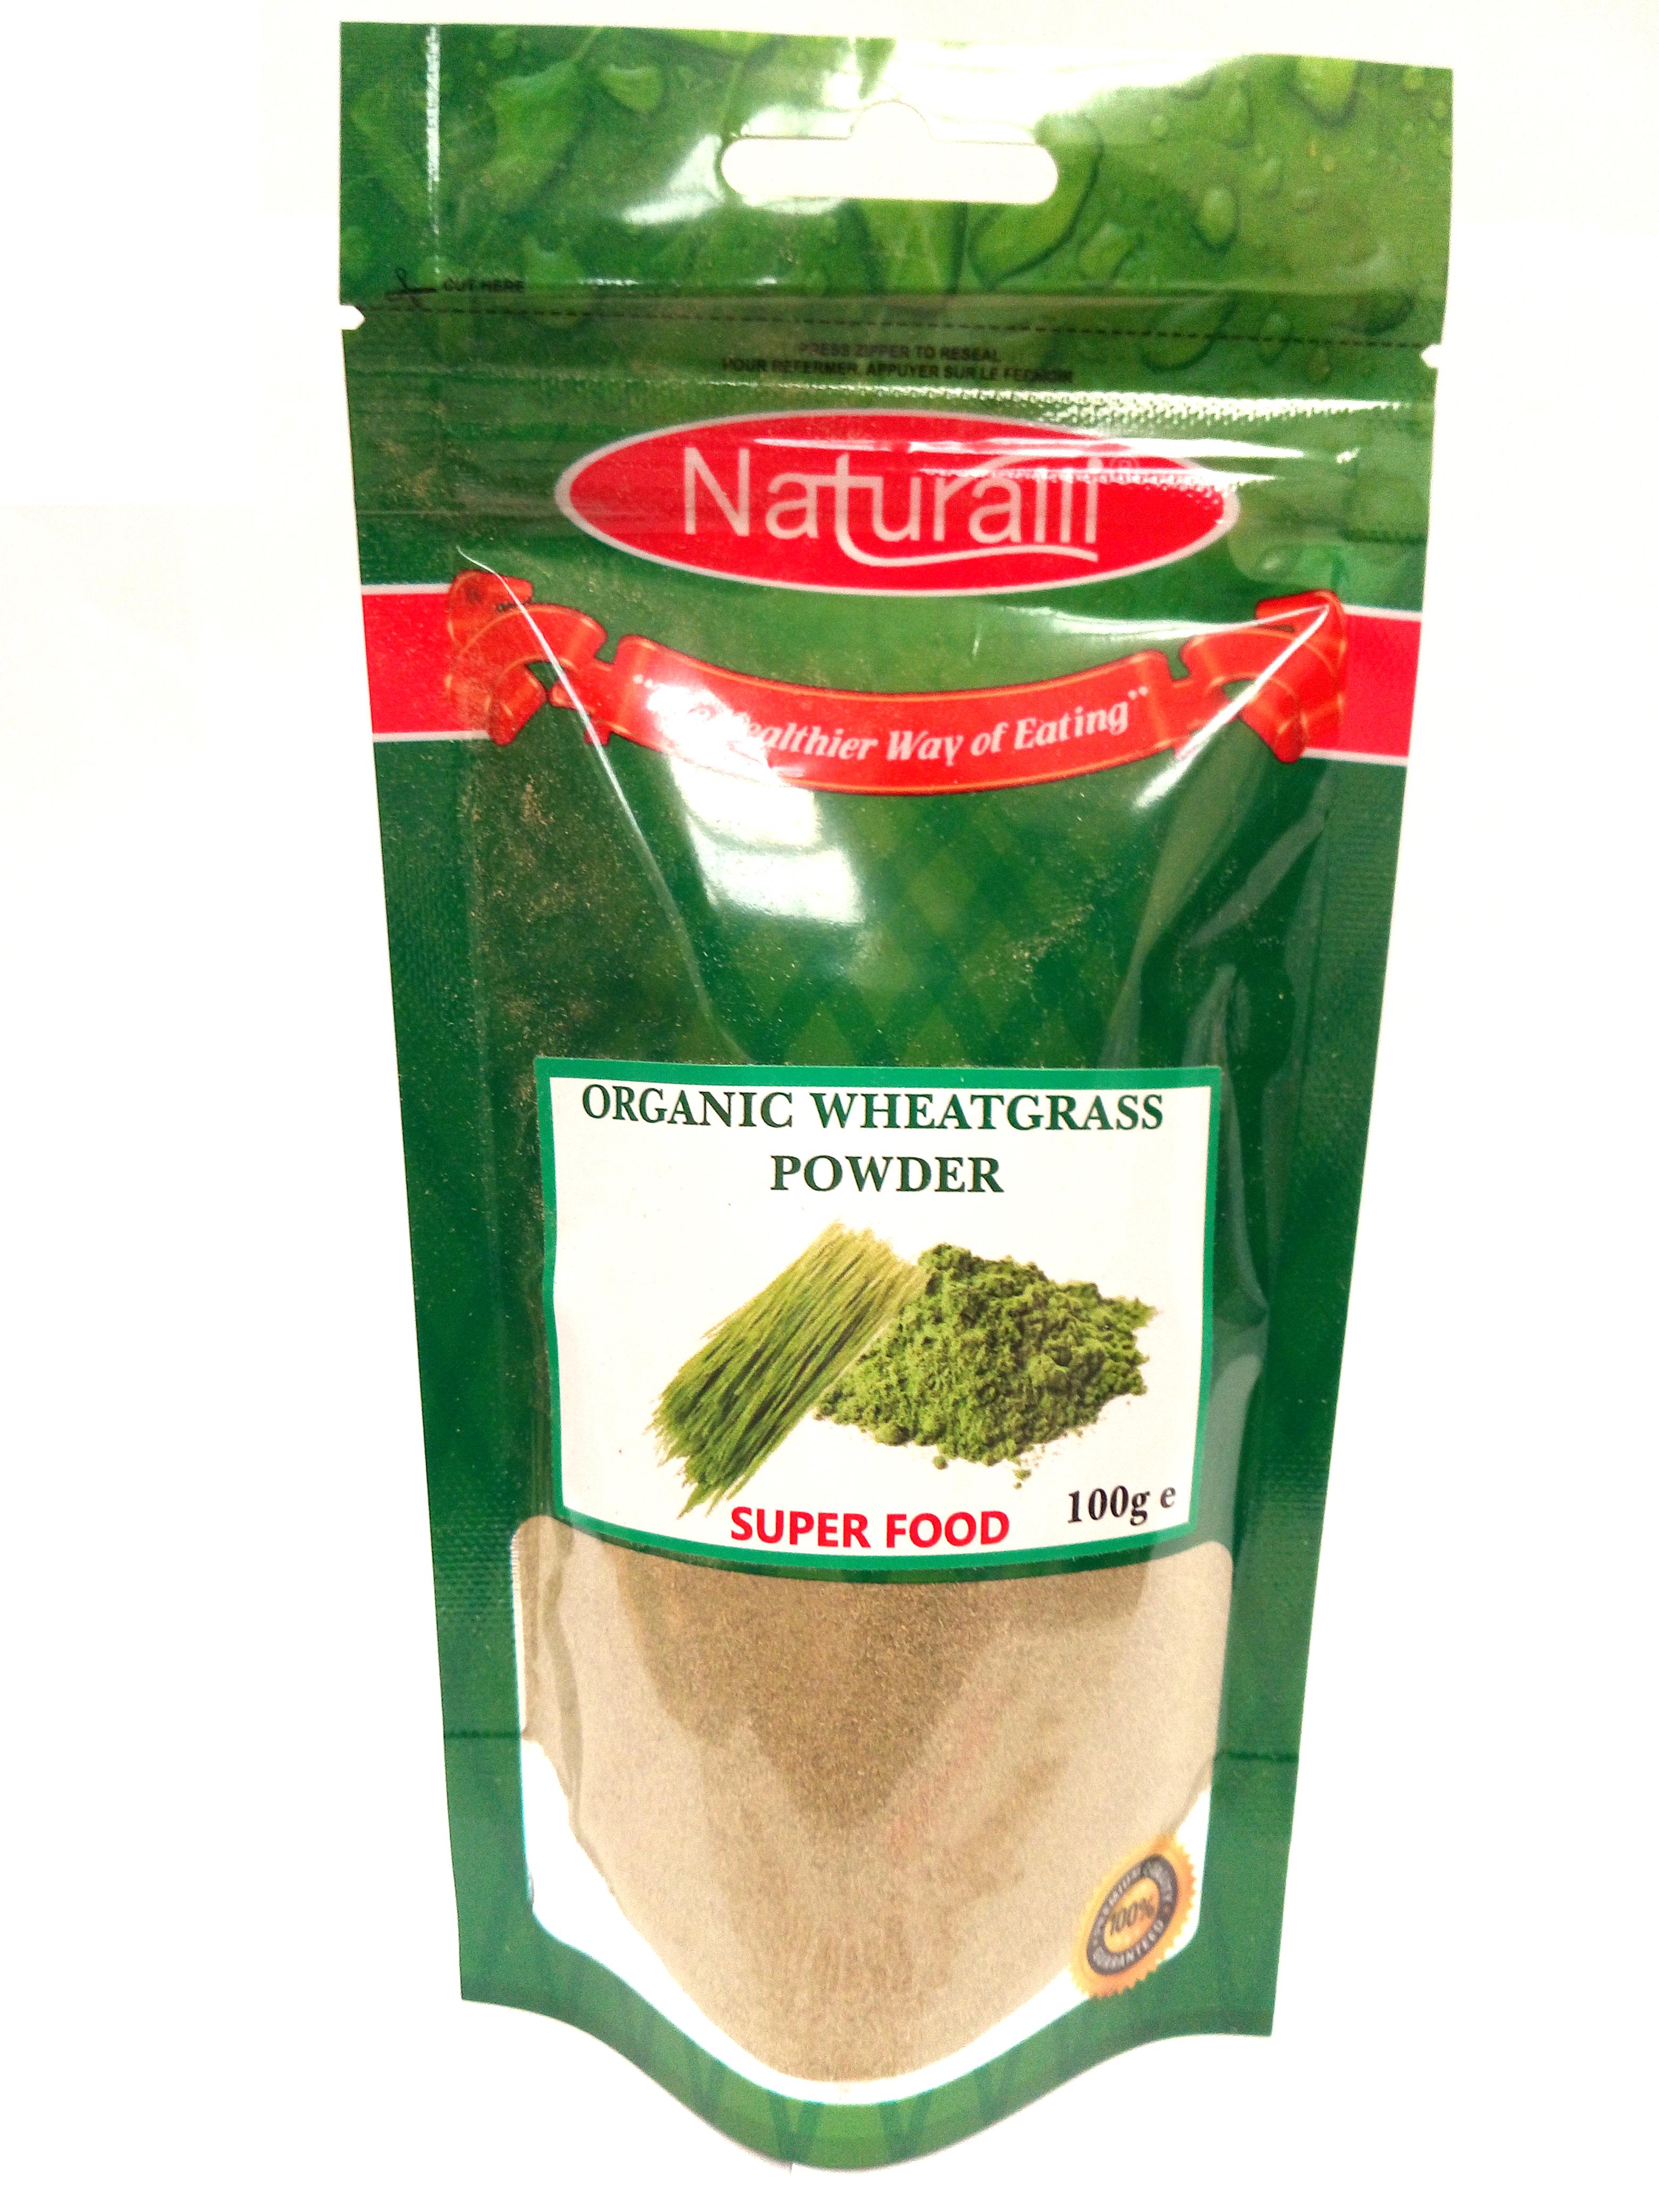 Naturalli Organic Wheat Grass Powder 100G